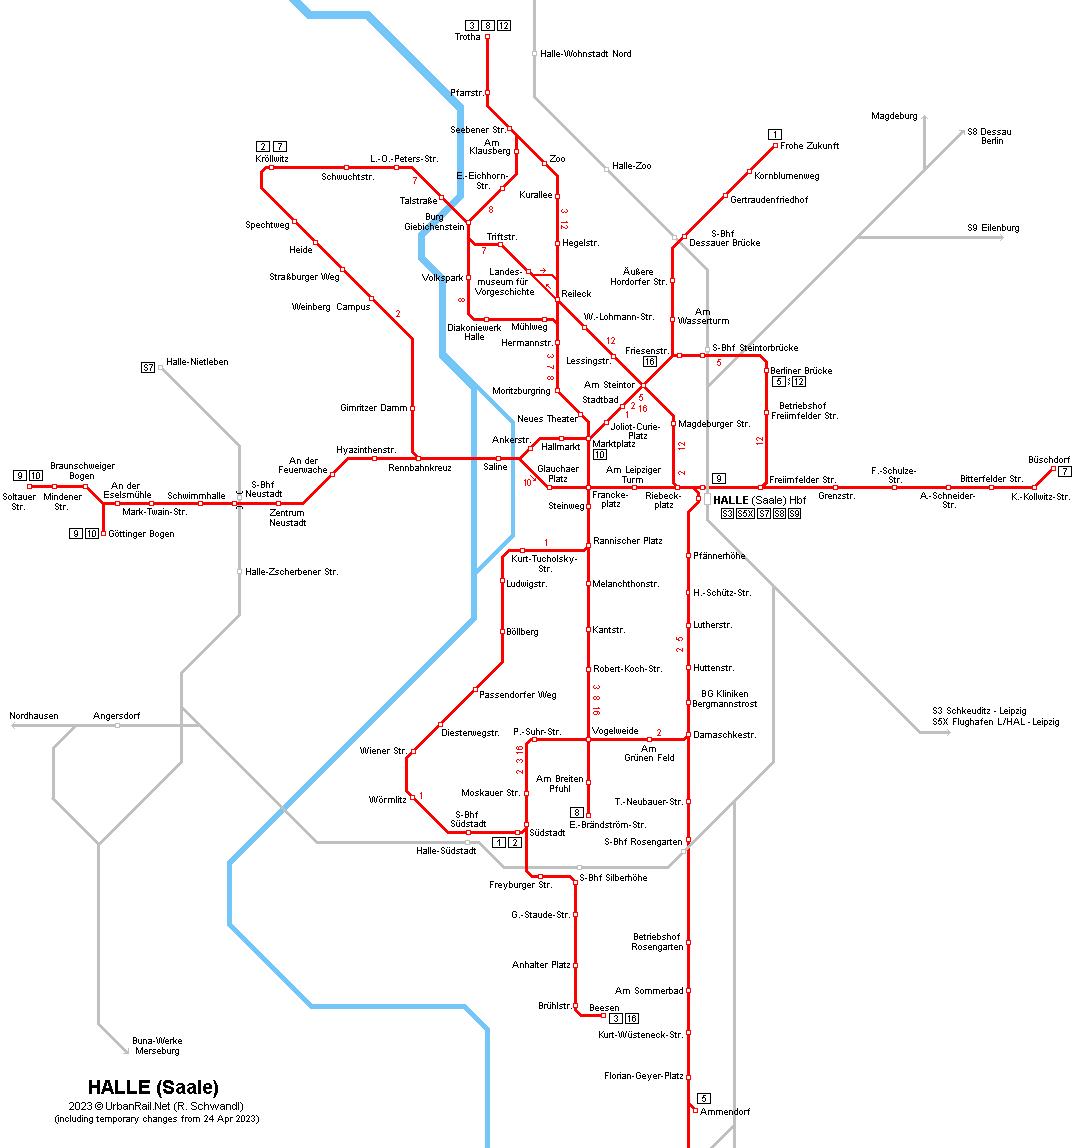 Halle Saale Karte.Urbanrail Net Europe Germany Sachsen Anhalt Halle